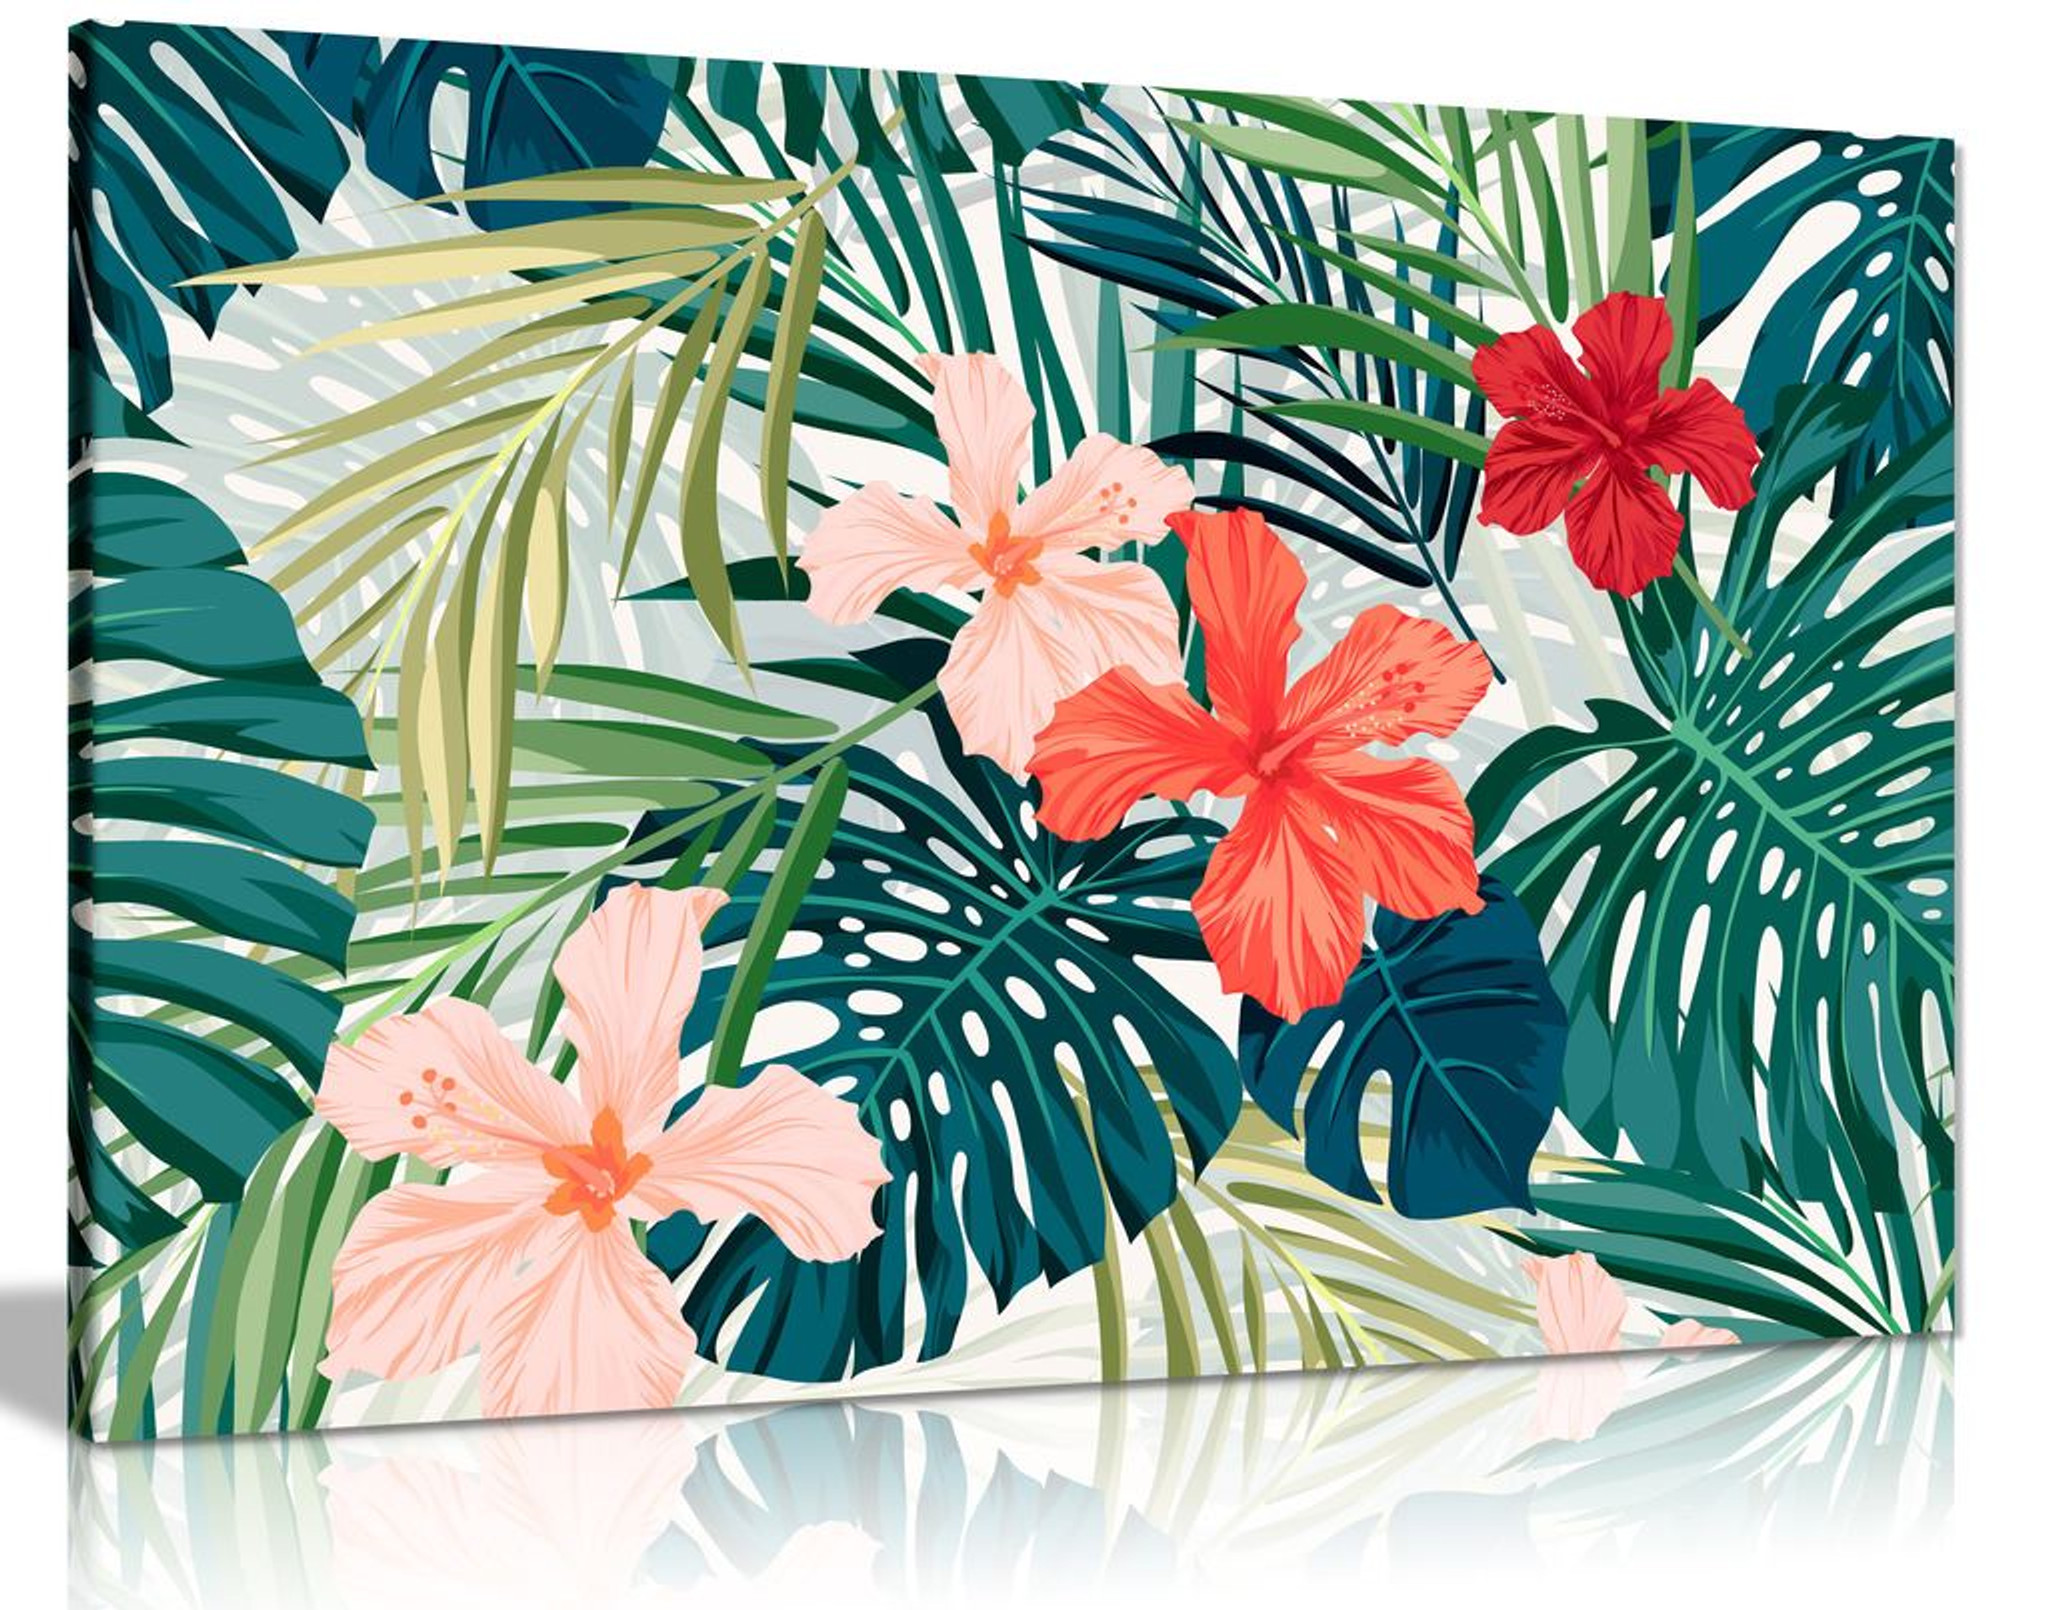 Botanical Jungle Palm Leaf Canvas Wall Art Picture Print